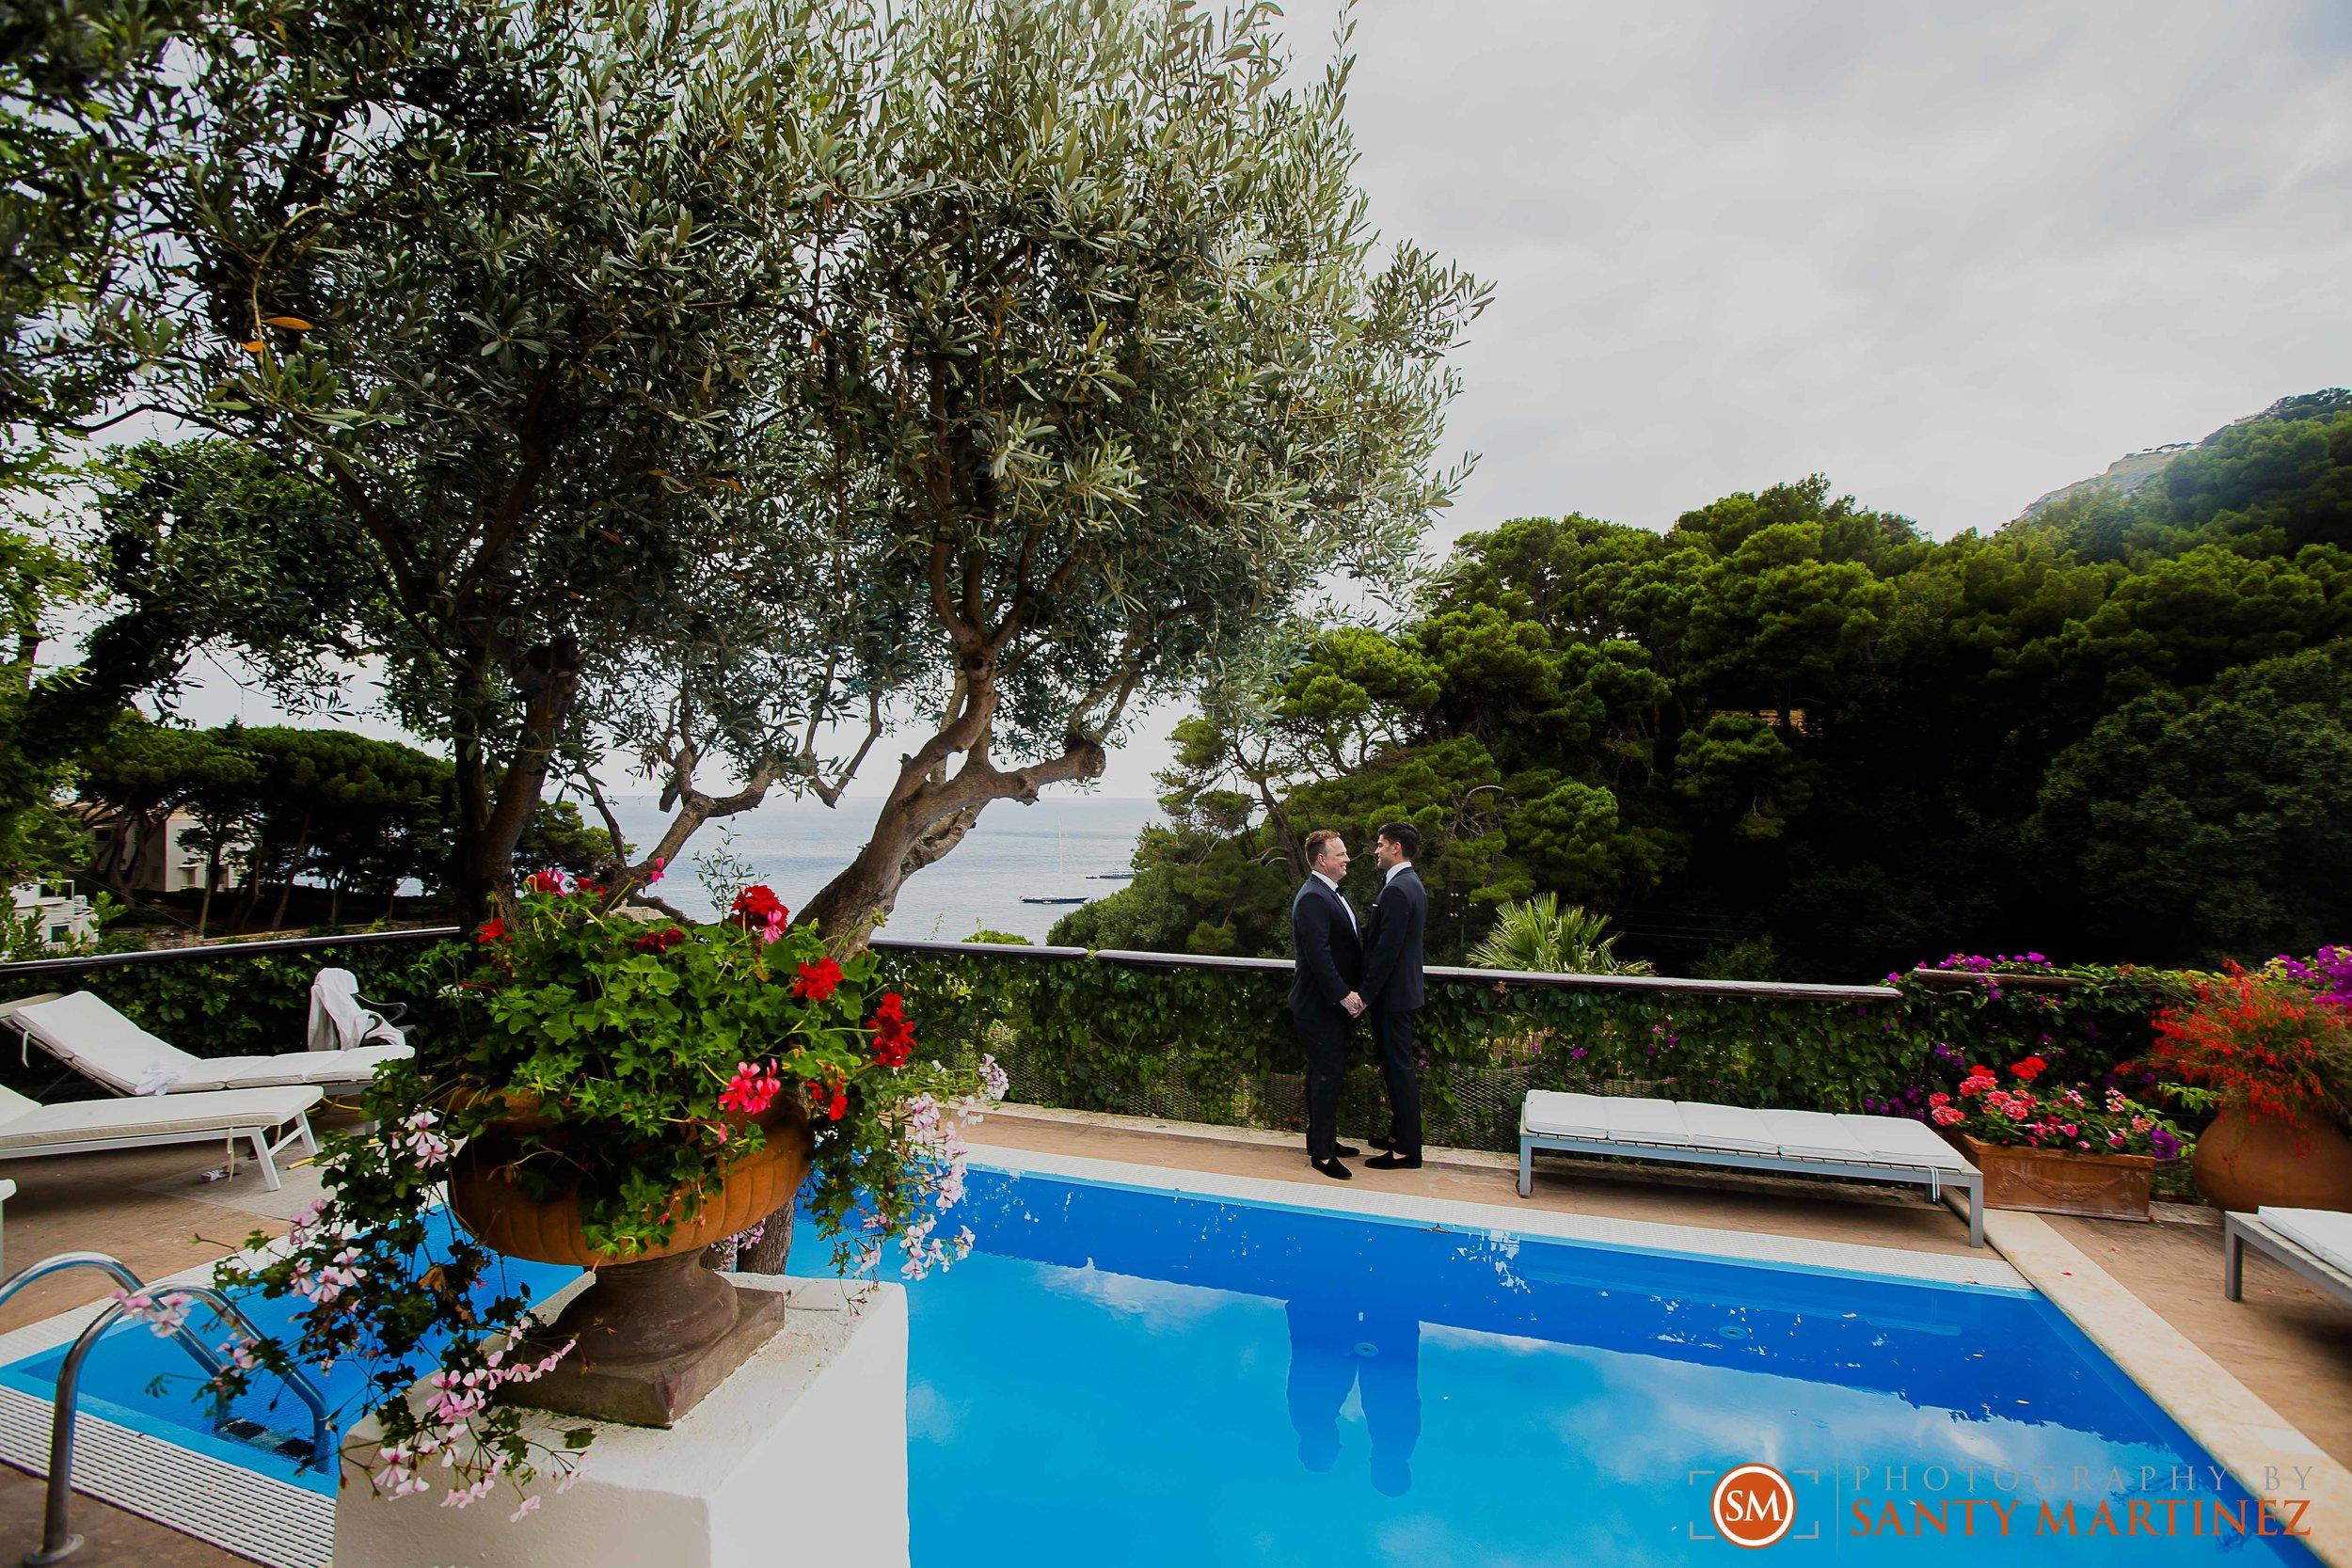 Wedding Capri Italy - Photography by Santy Martinez-16.jpg